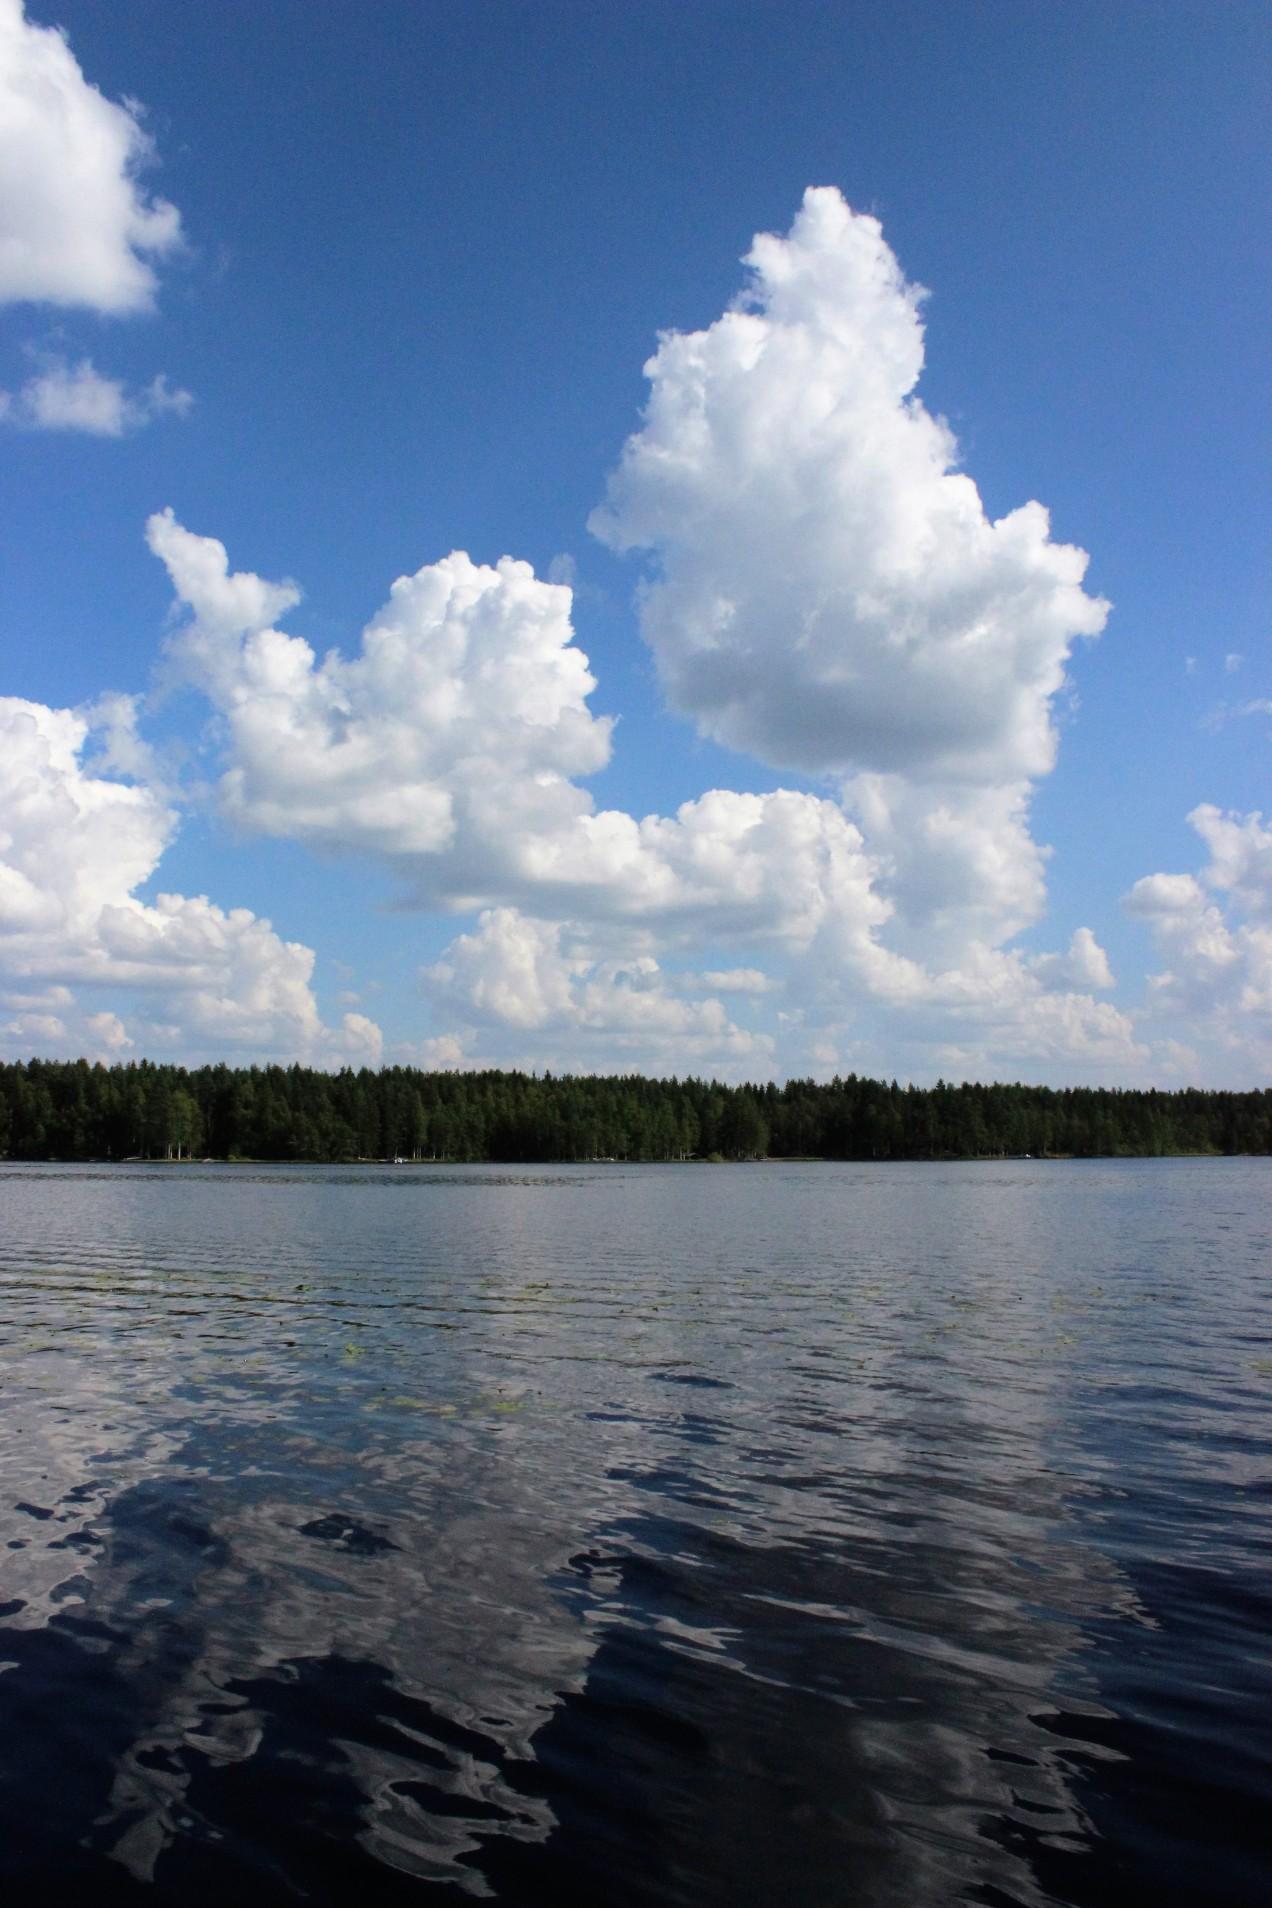 Menkijärvi